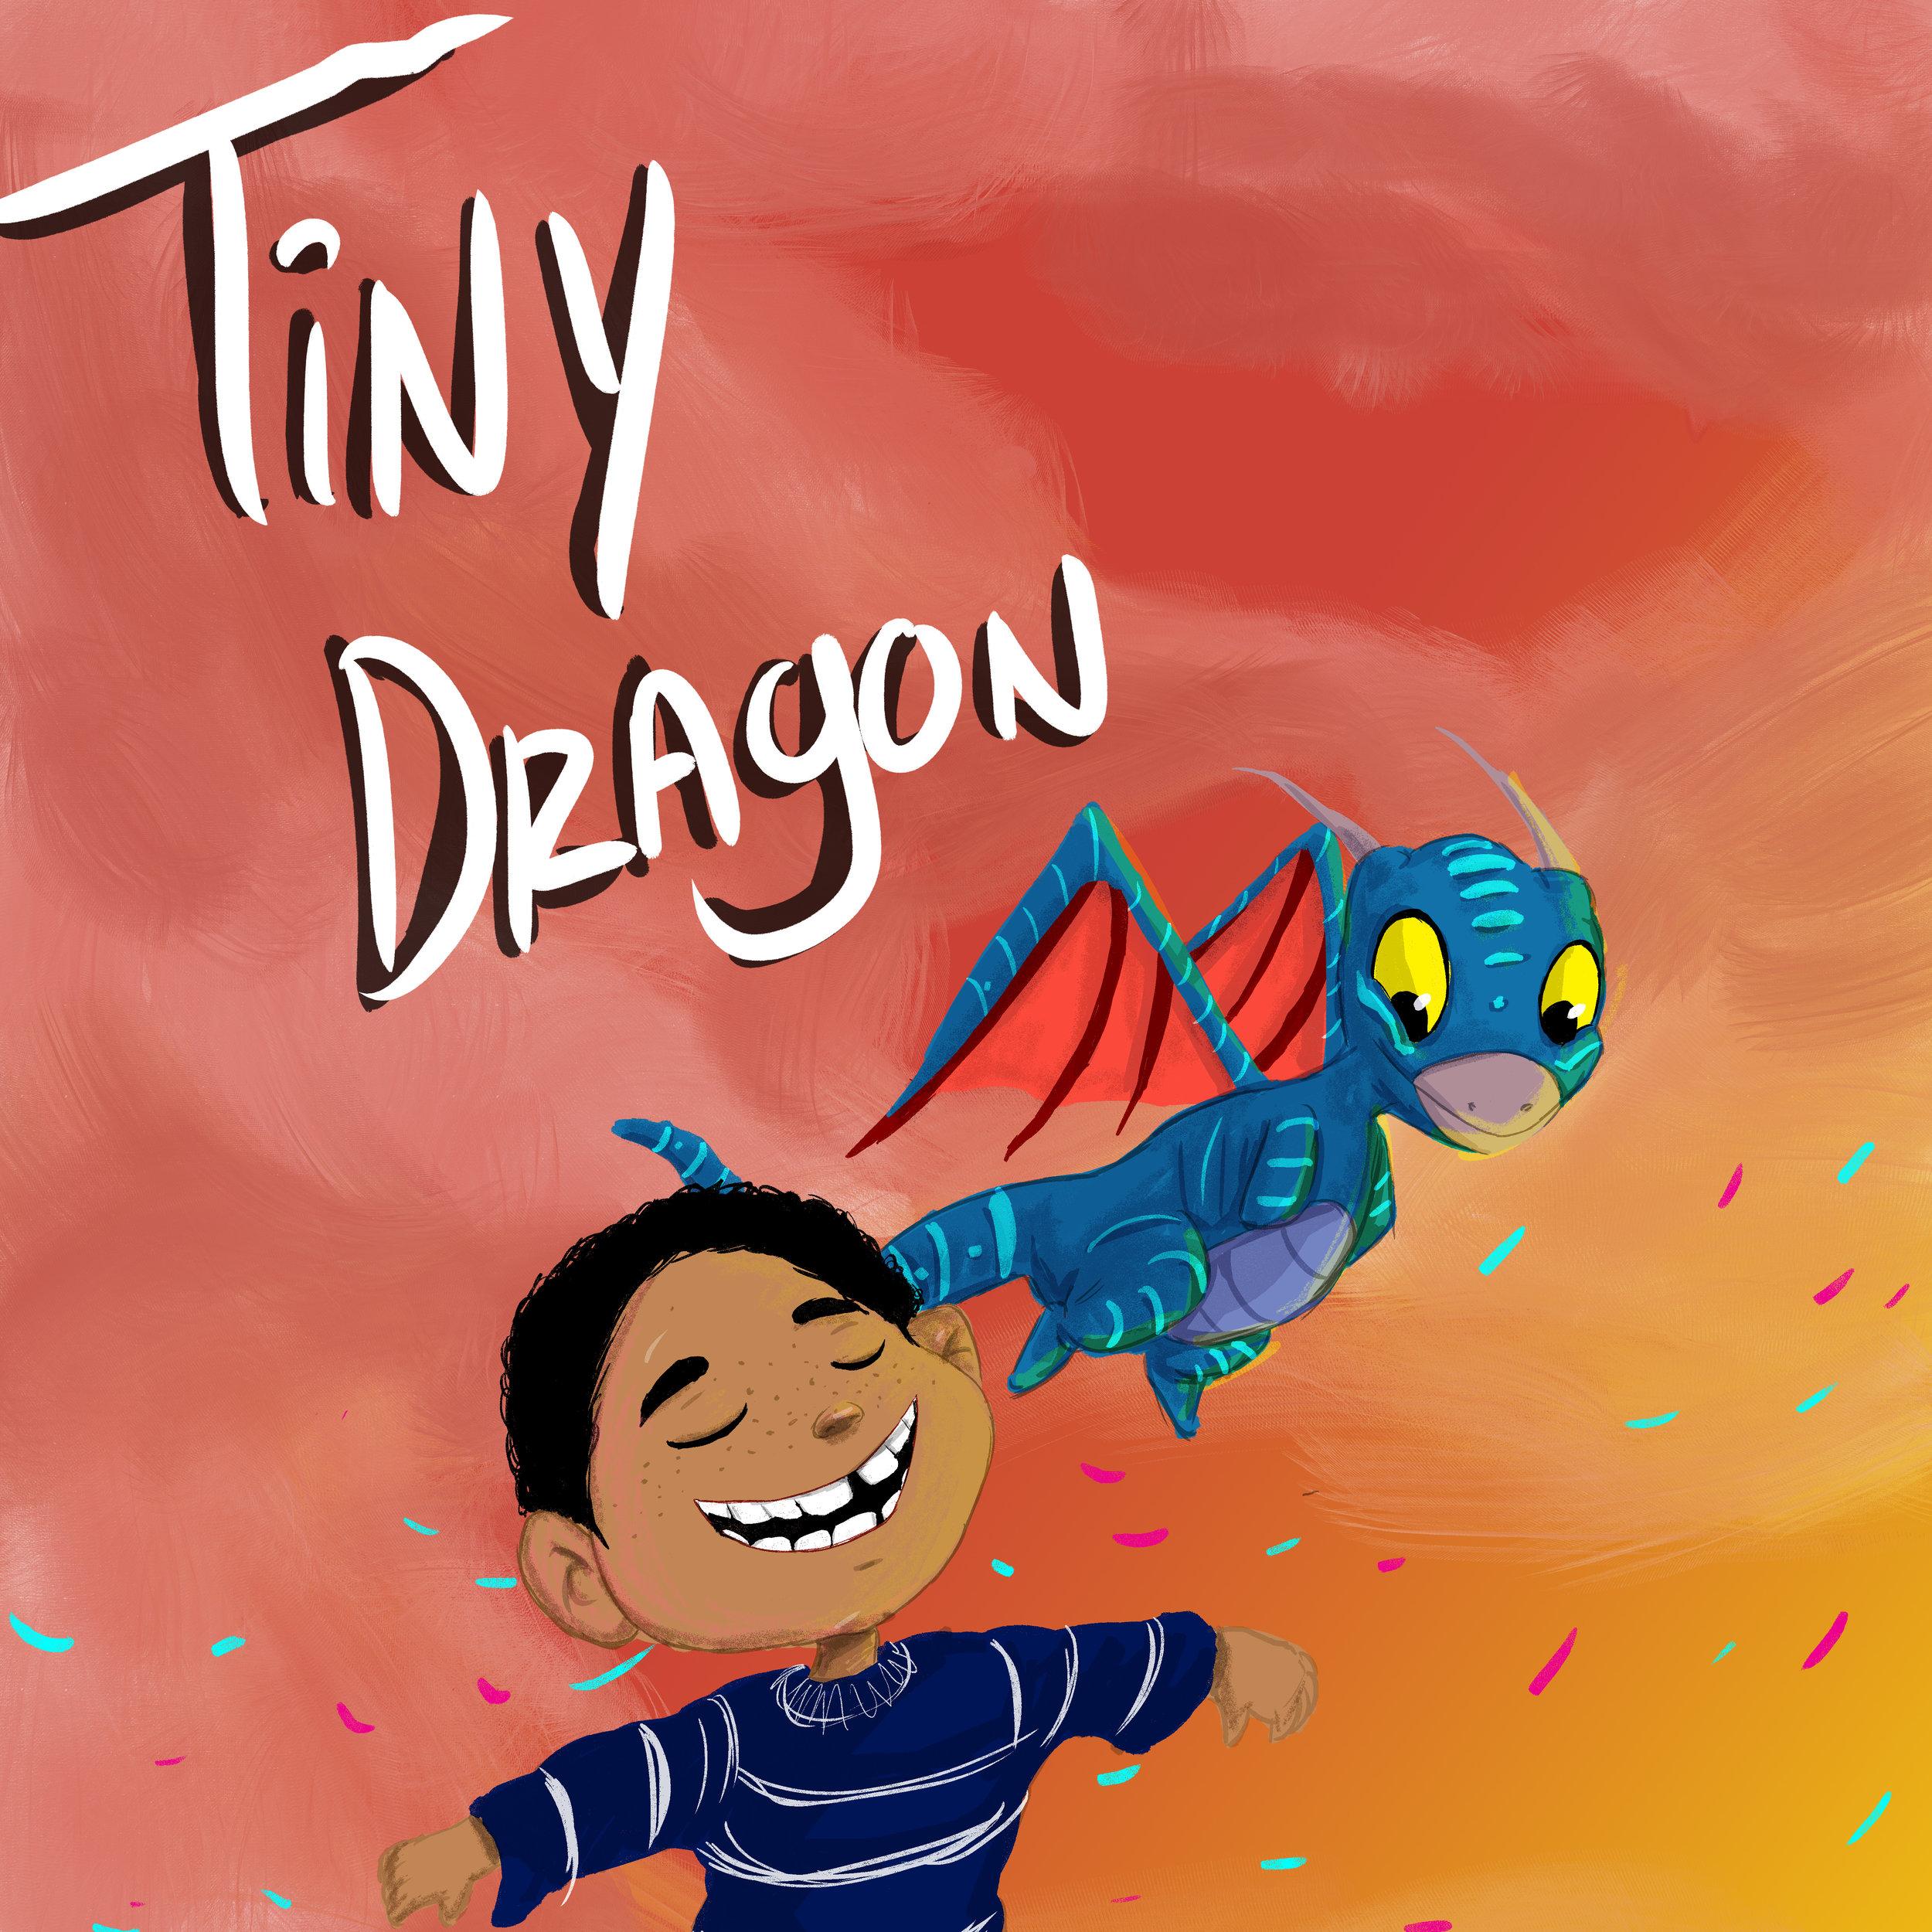 TinyDragonFinal Cover.jpg